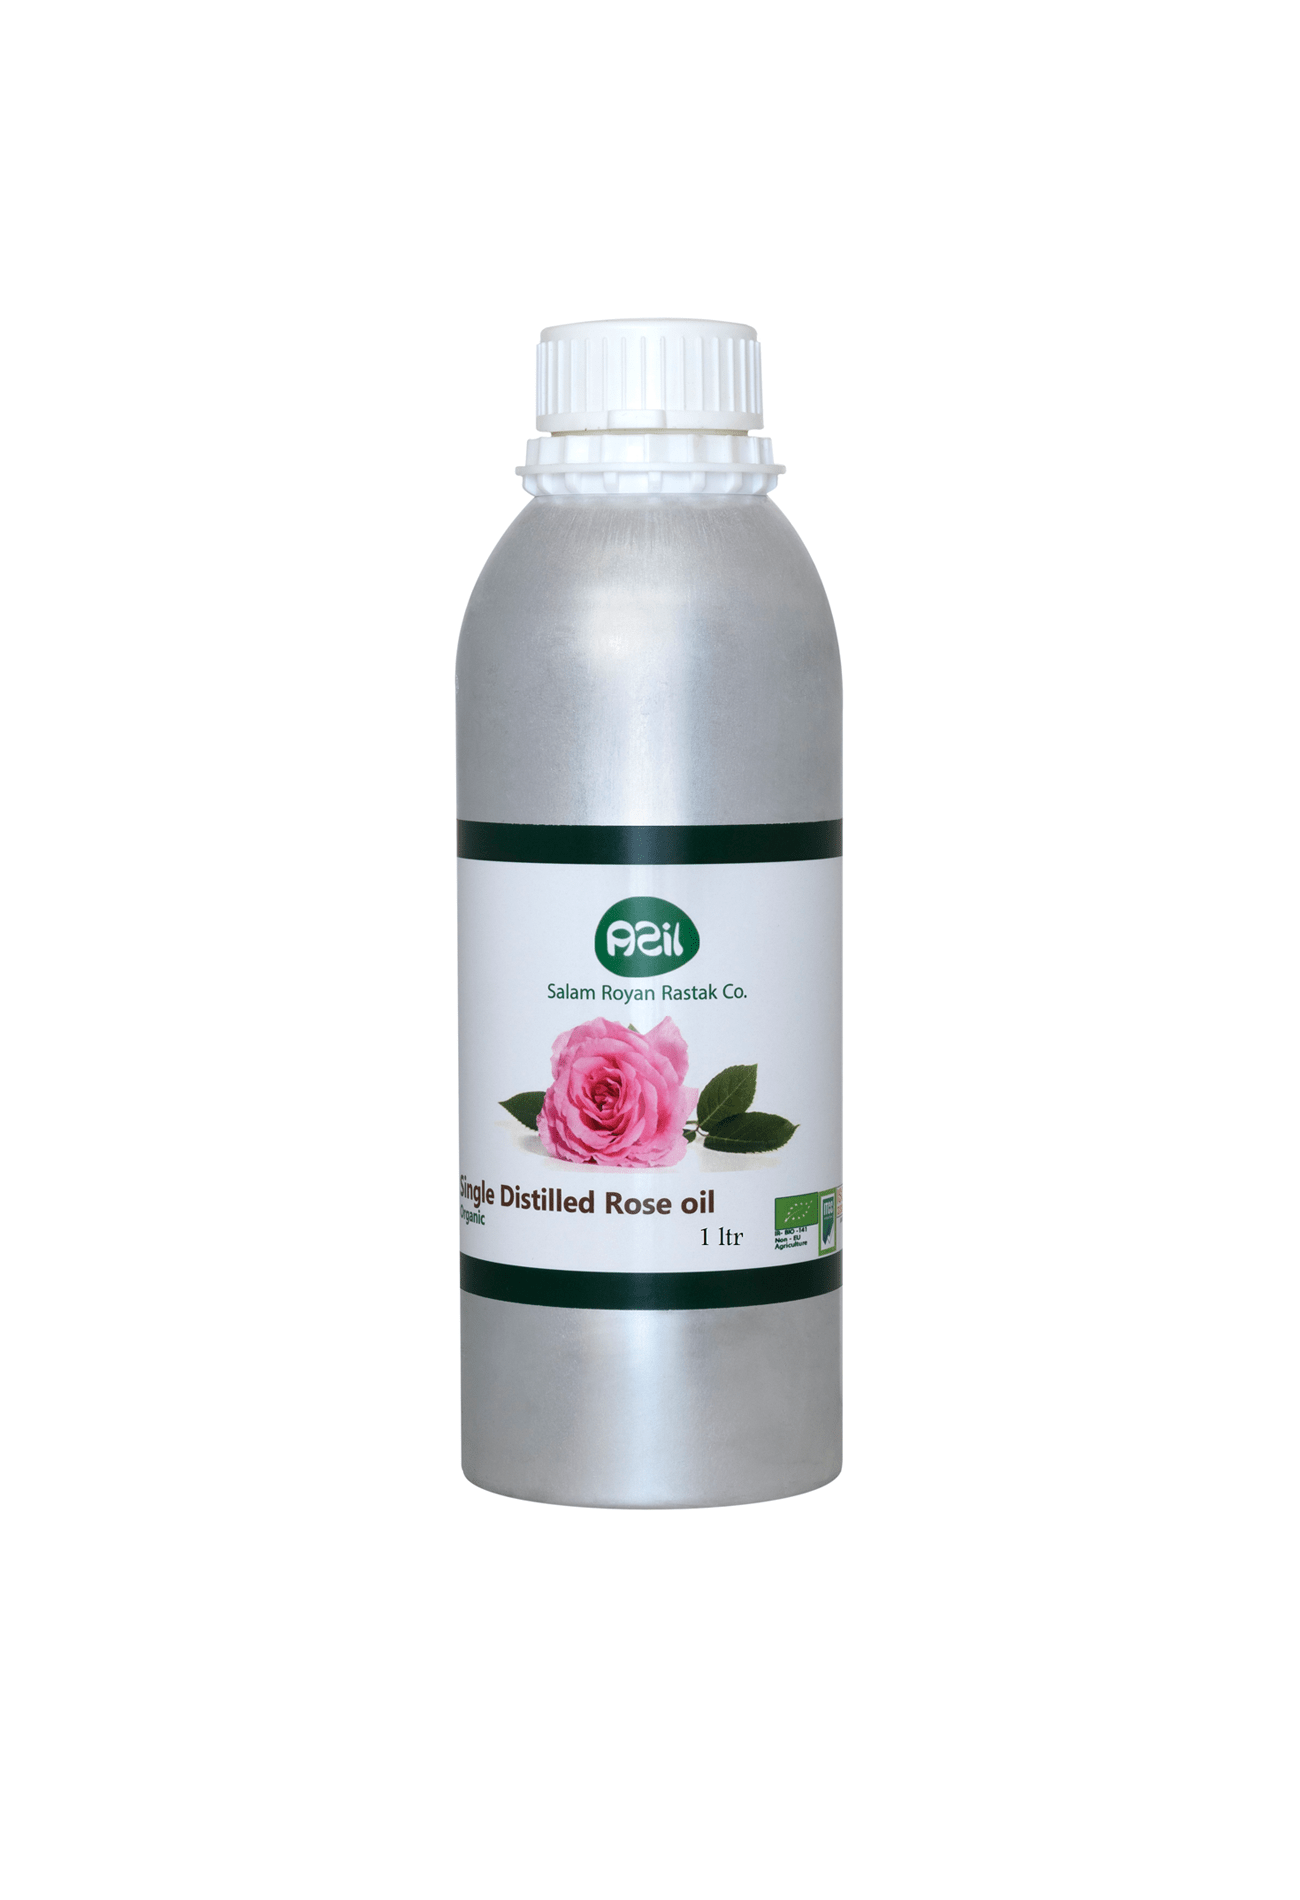 Single distilled rose oil  - Azil Single Distilled Rose Oil